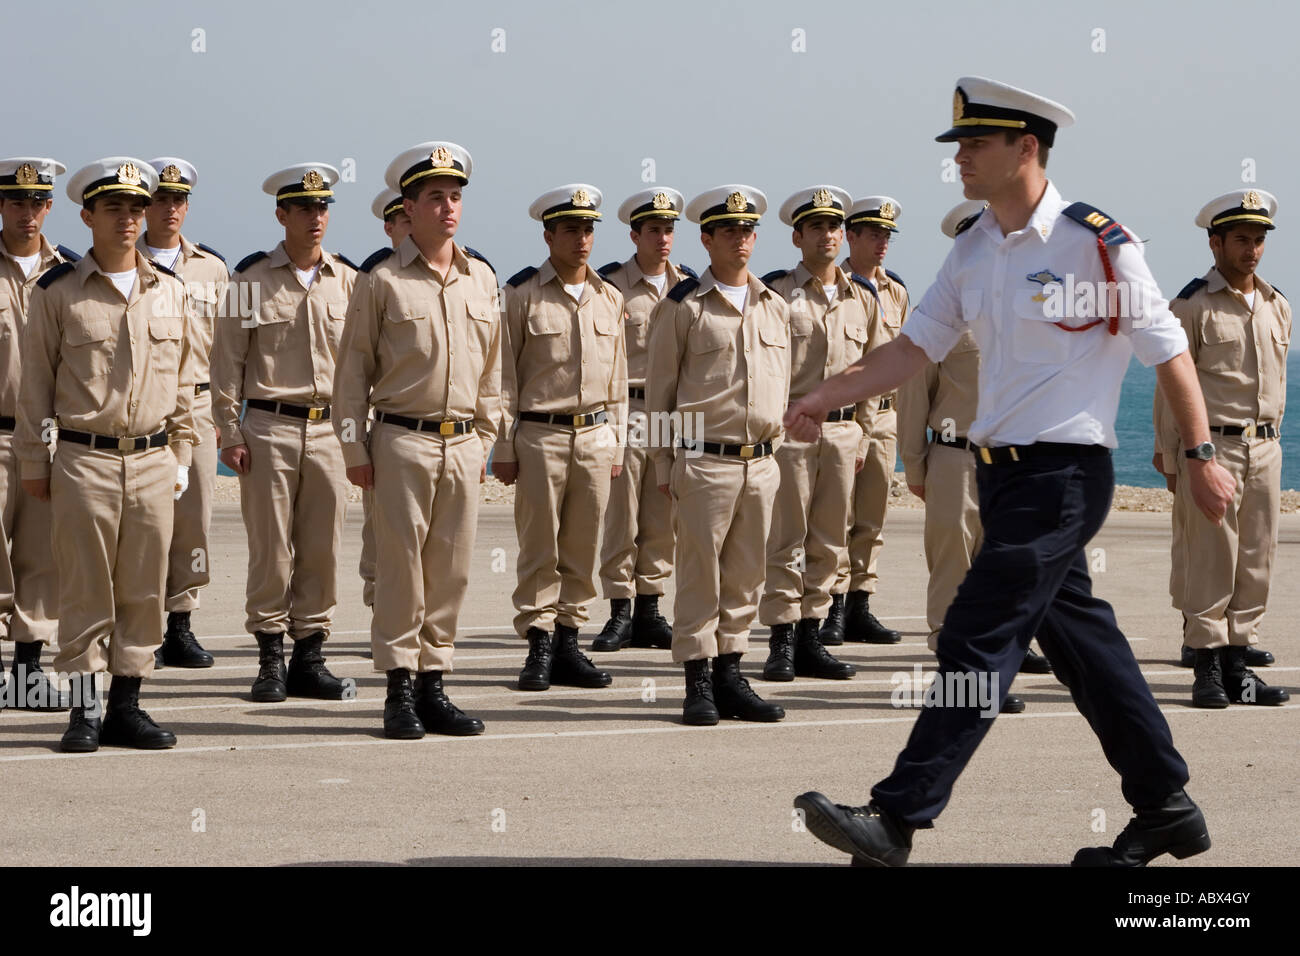 Stock Photo of An Israeli Navy Military Ceremony Stock Photo